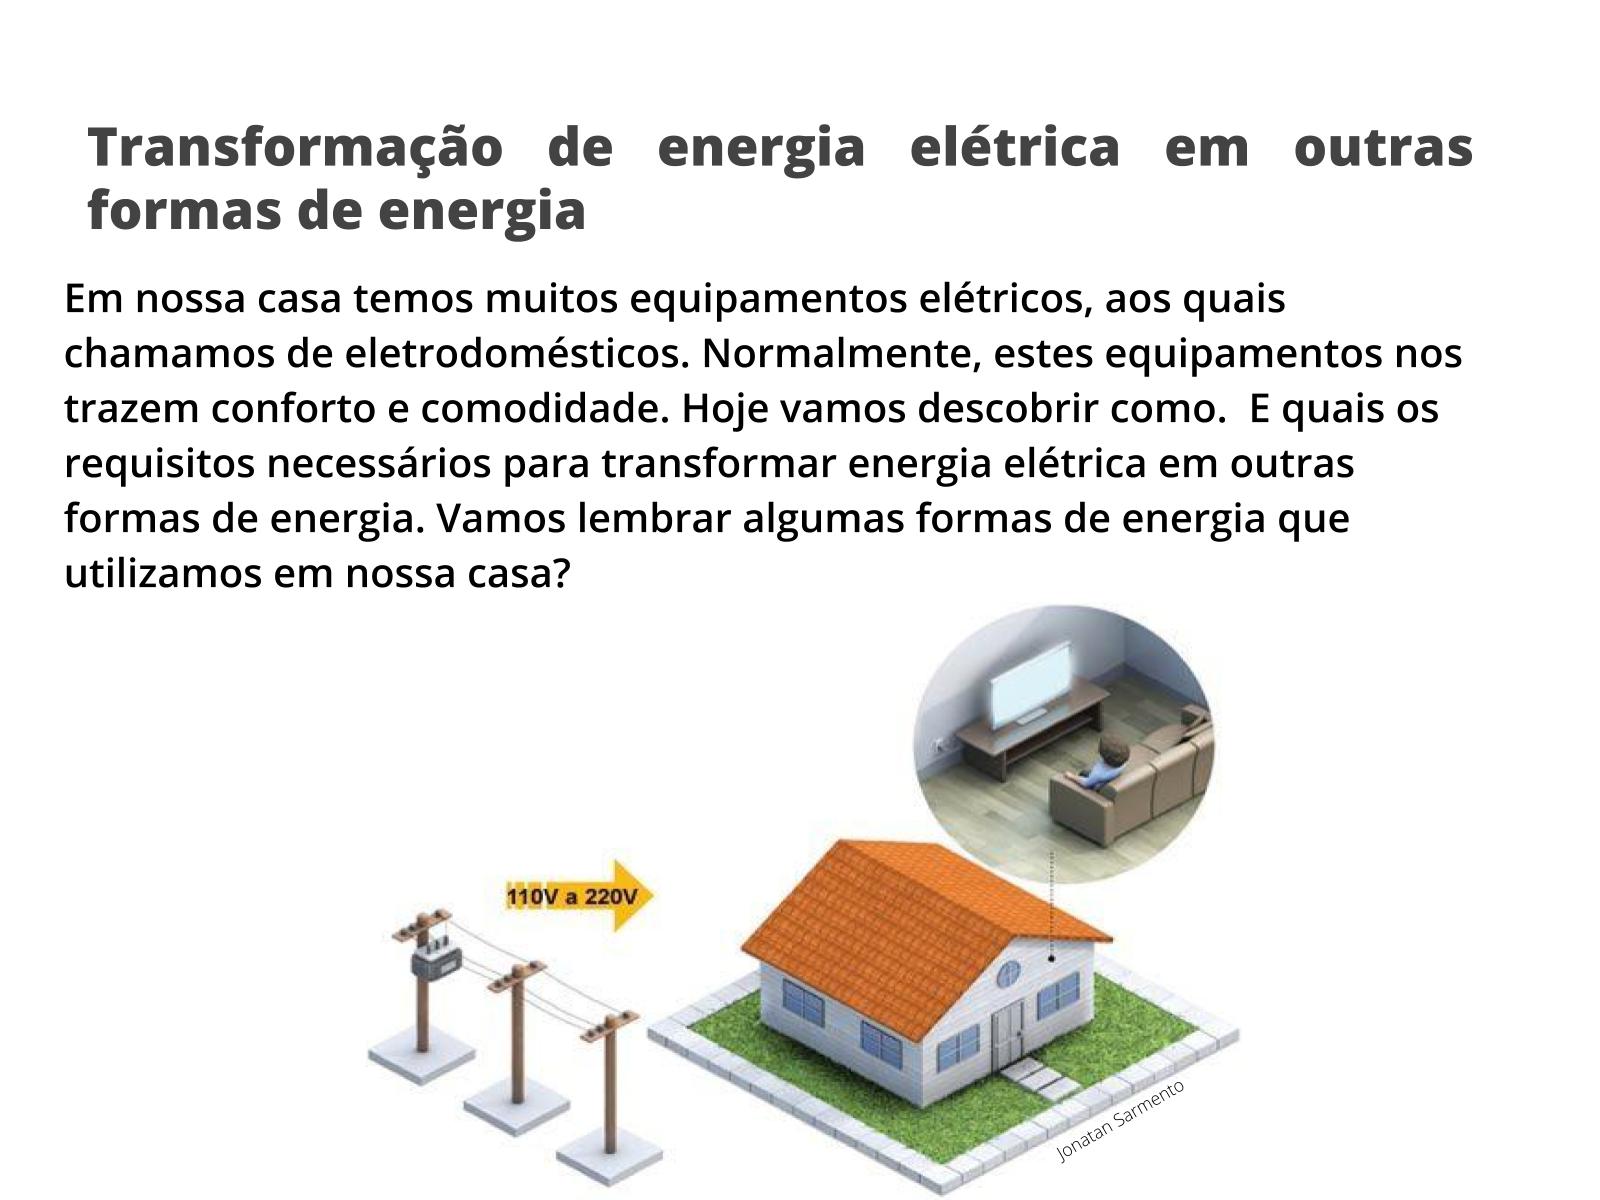 Grandeza e unidade de energia elétrica